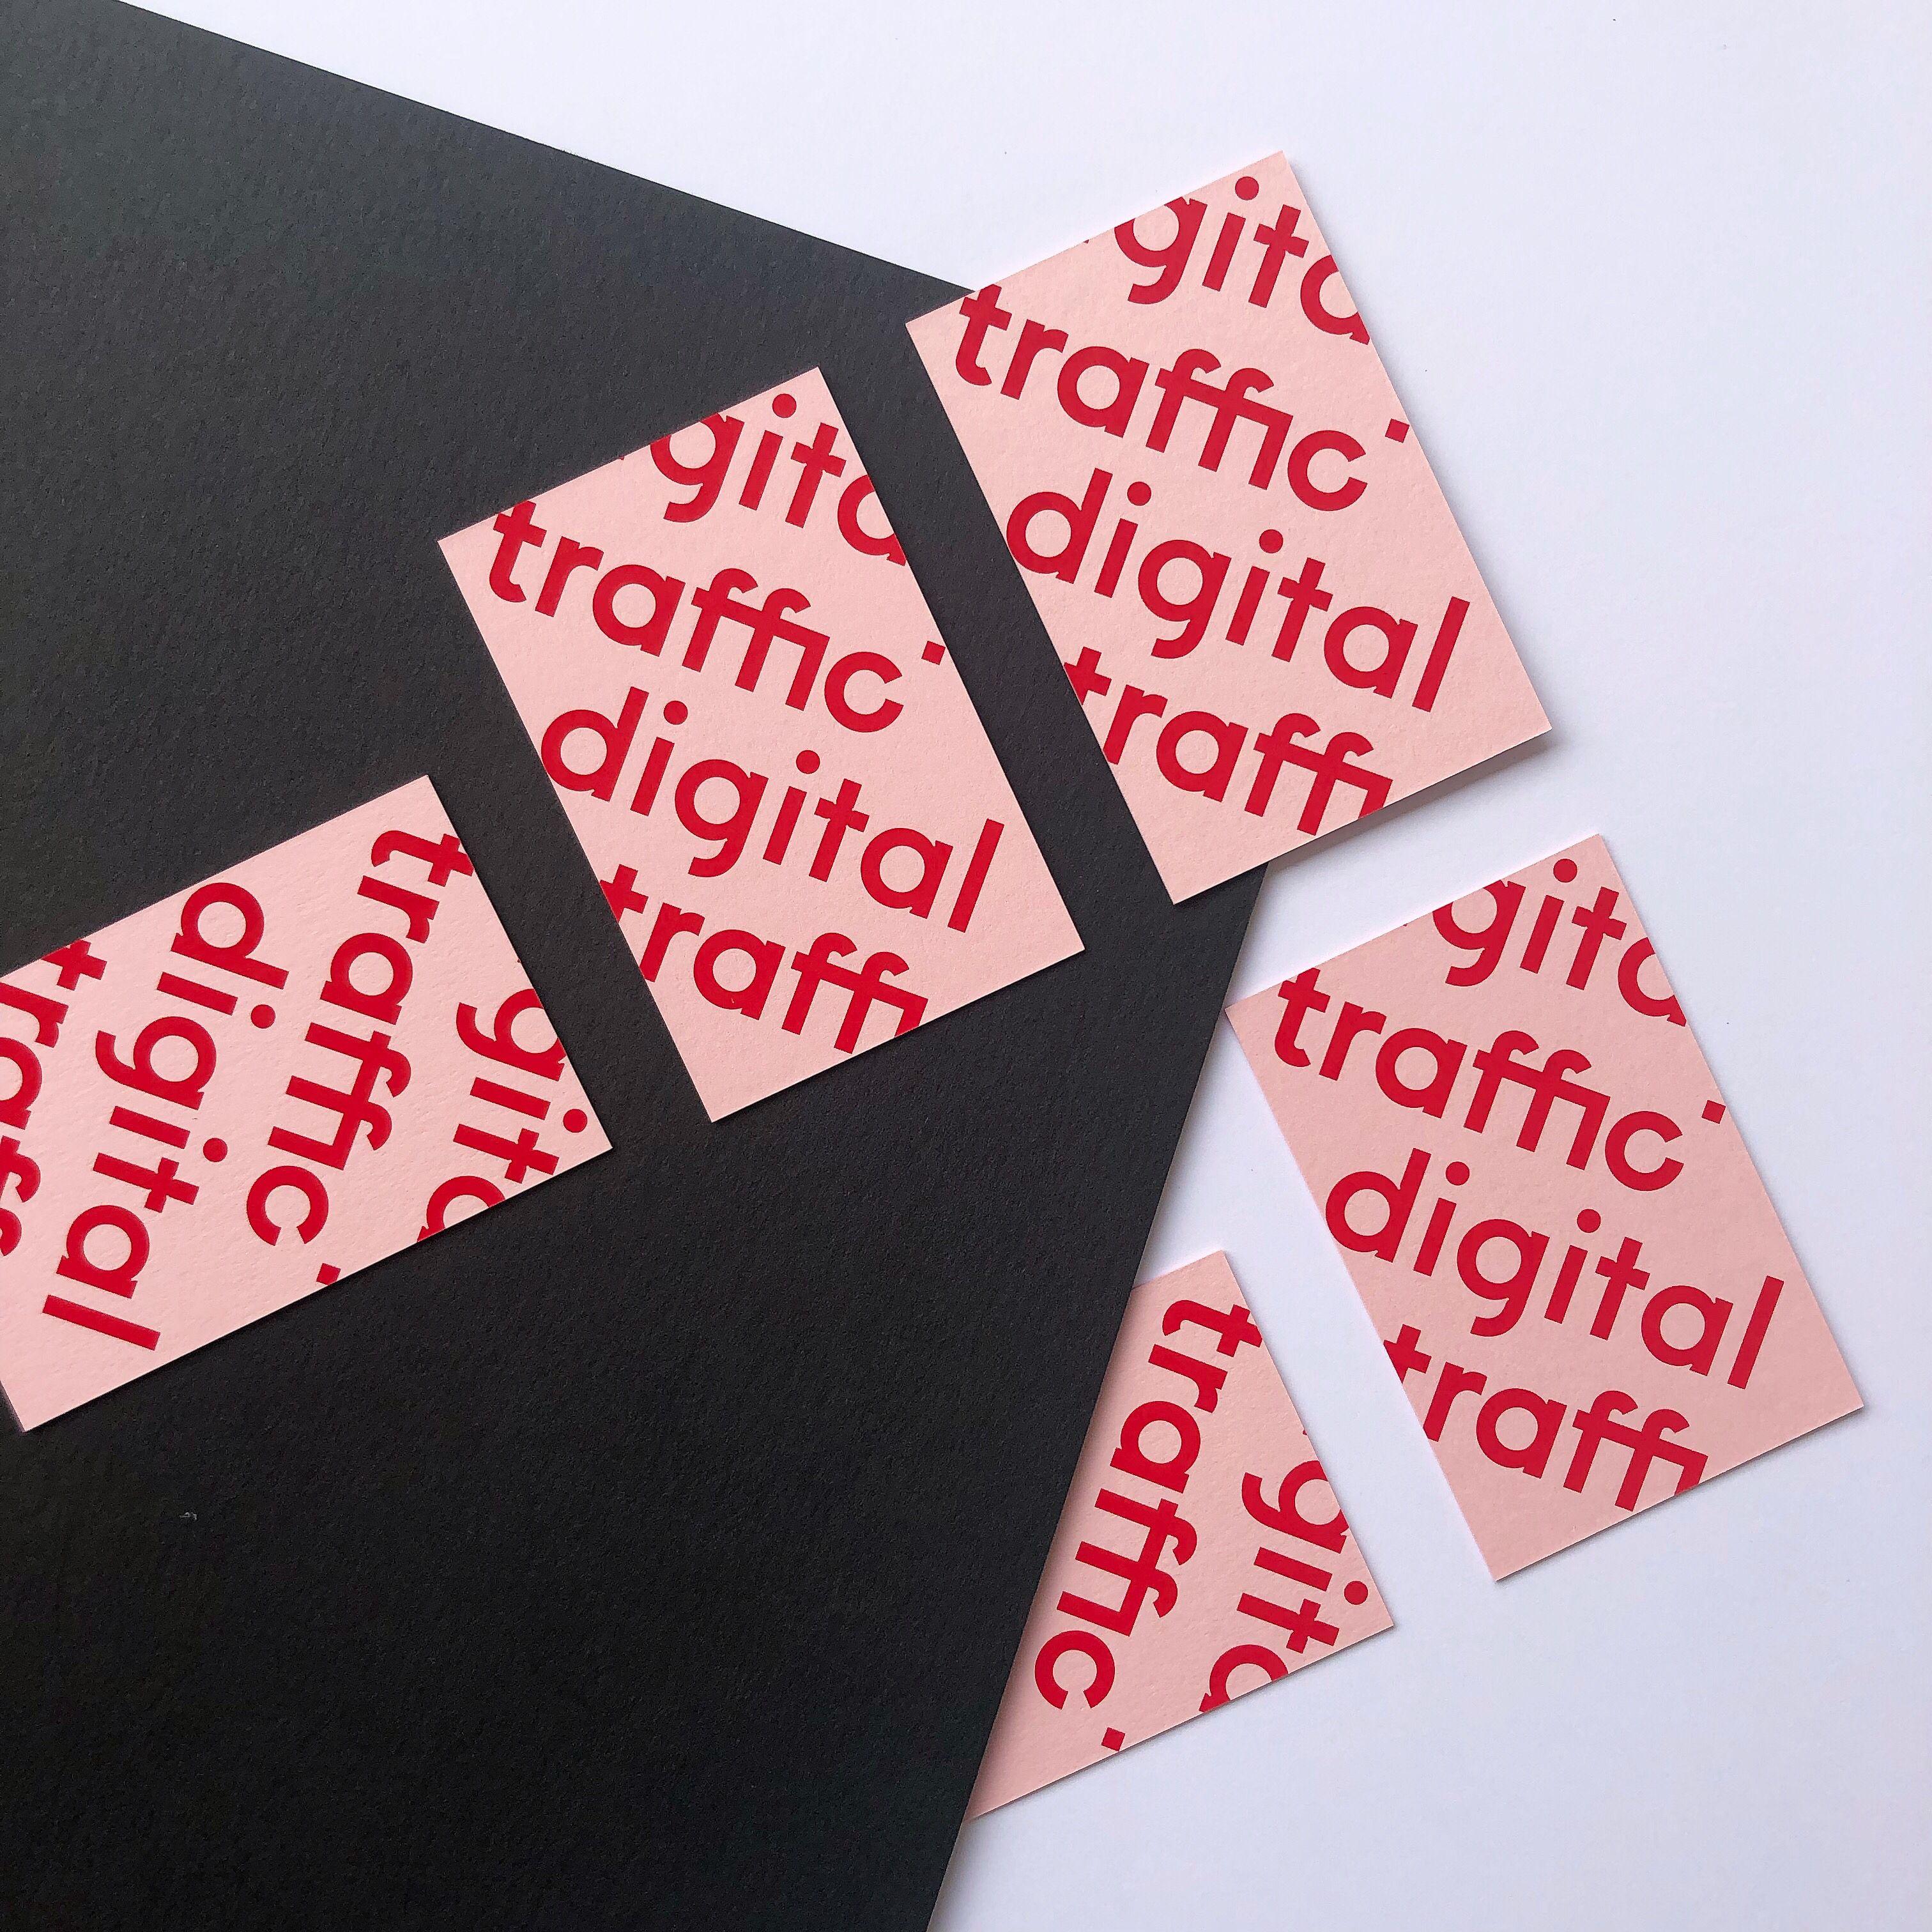 Screen Printed Business Cards London Dot Studio Embossed Business Cards Printing Business Cards Debossed Business Card